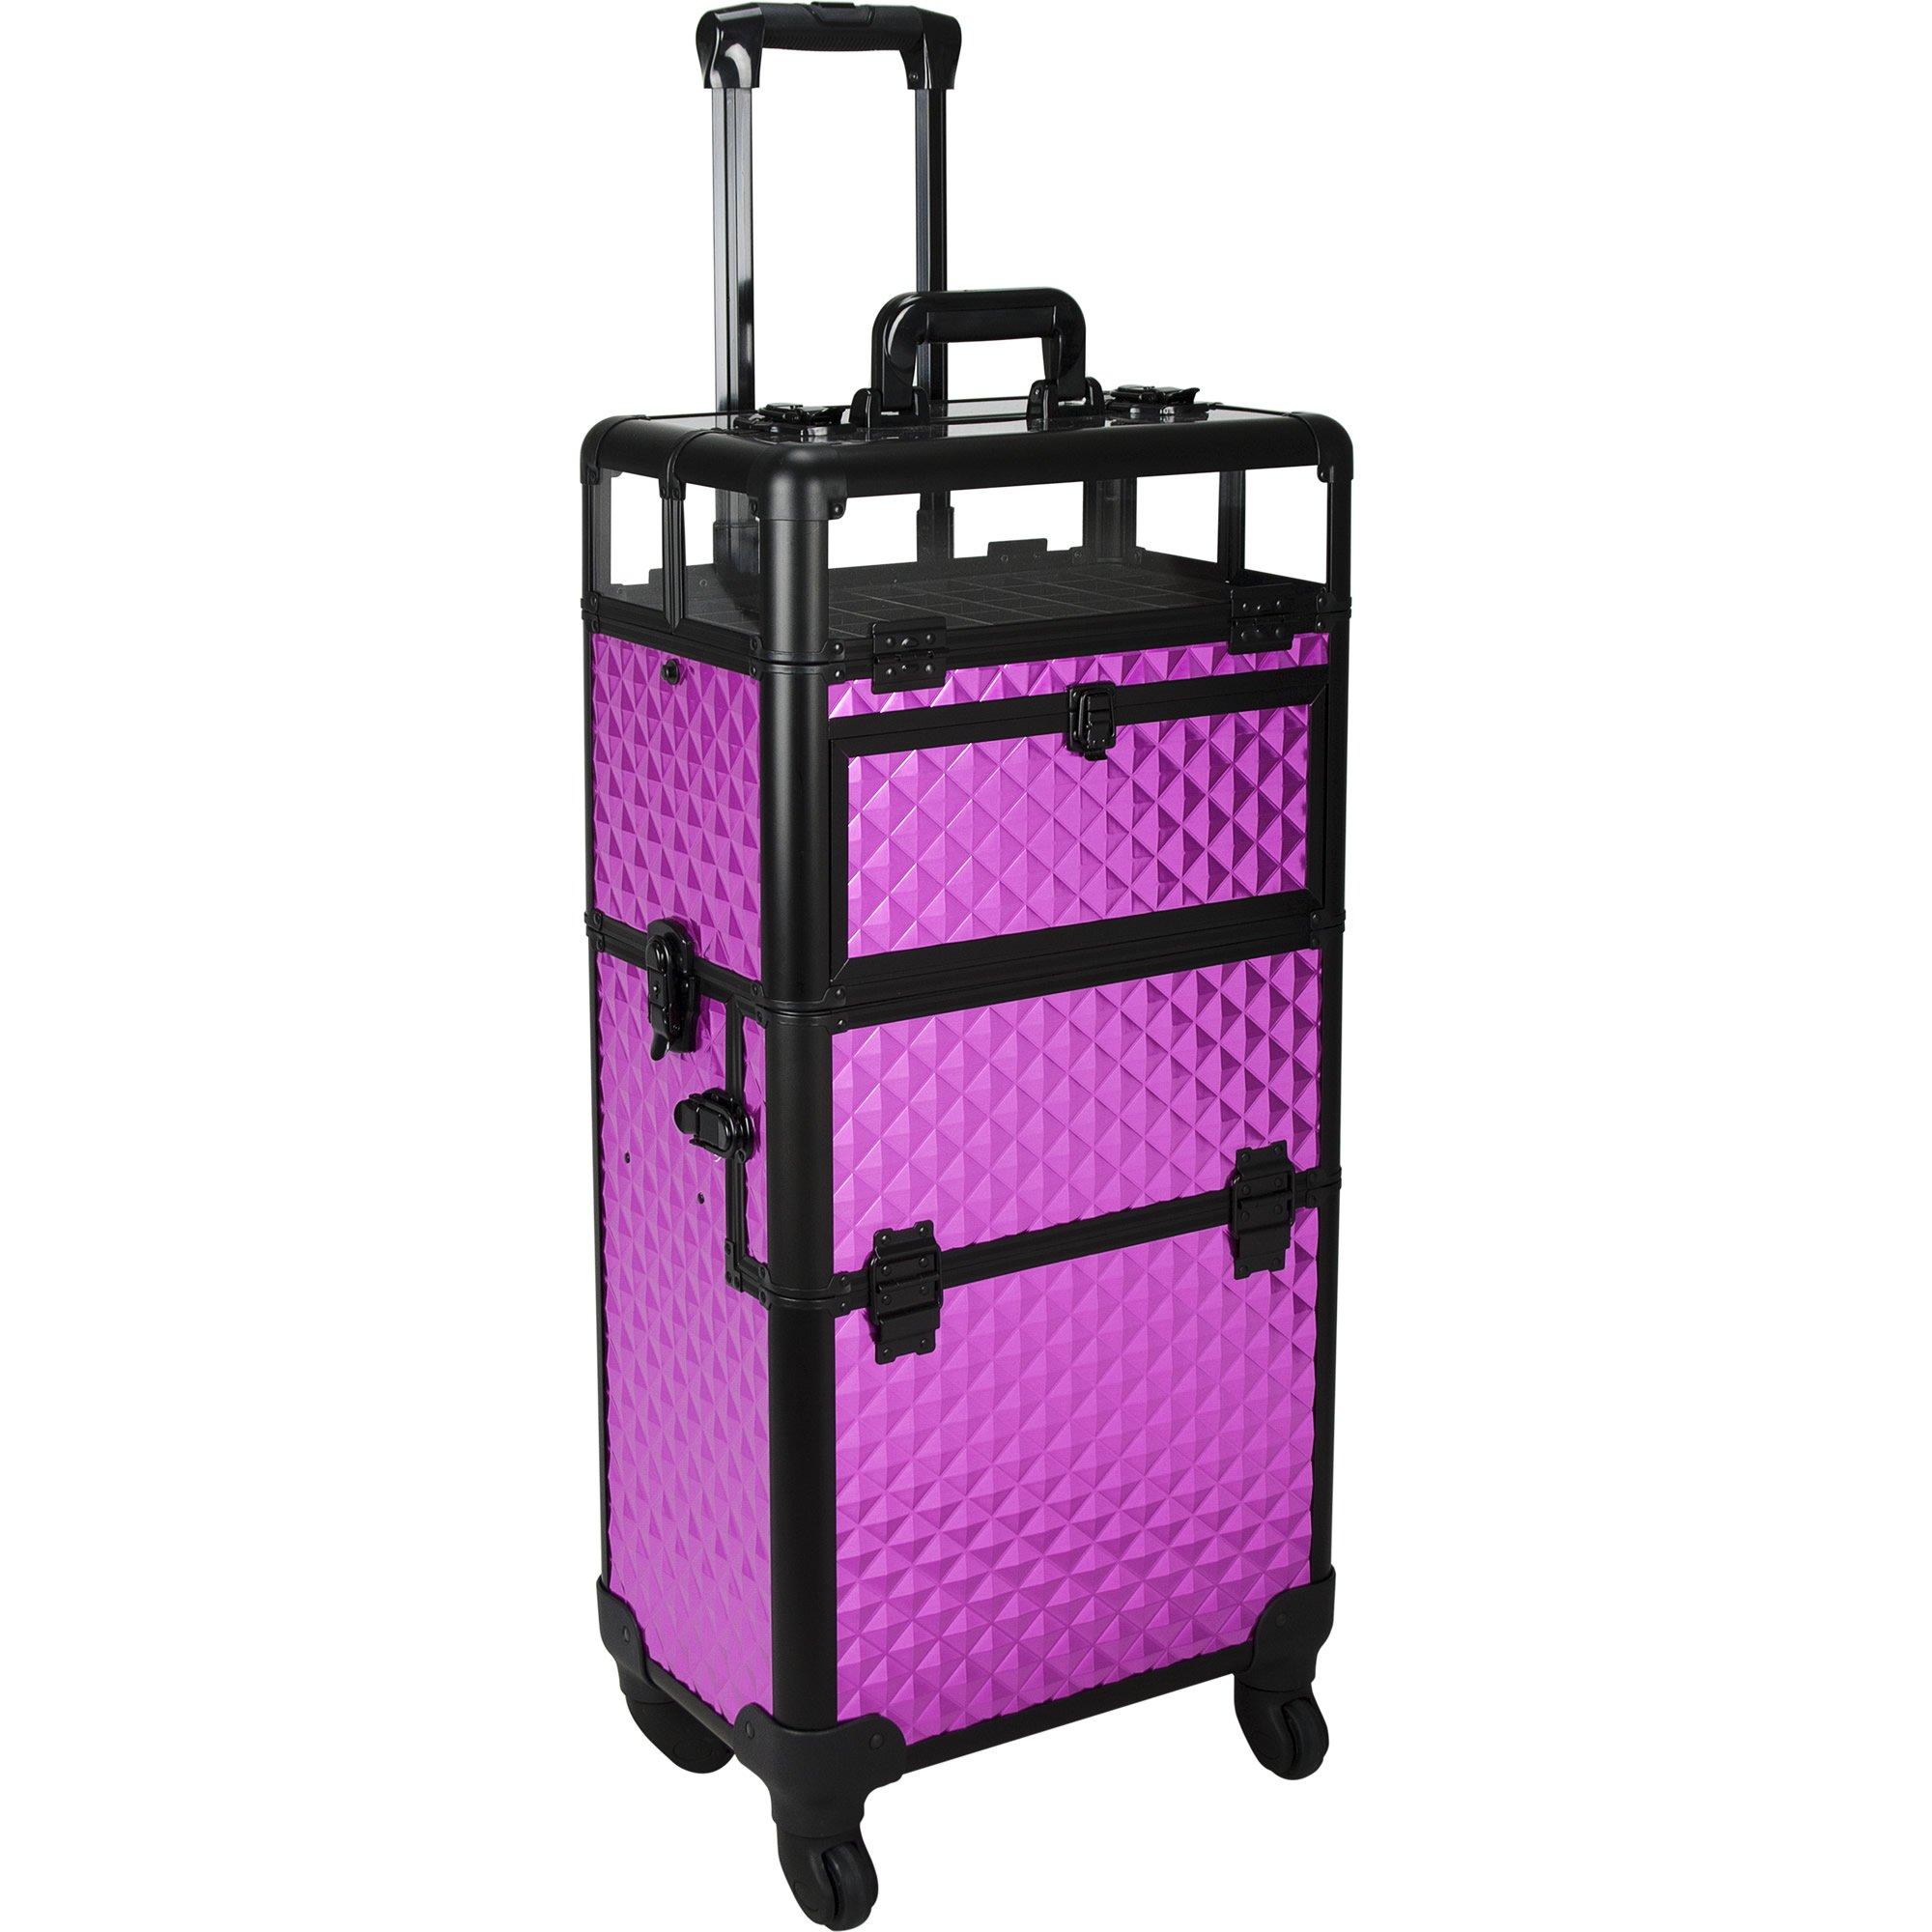 Sunrise Gloriosa 2-In-1 Rolling Makeup Case Professional Nail Travel Organizer Box, Purple Diamond, 20 Pound